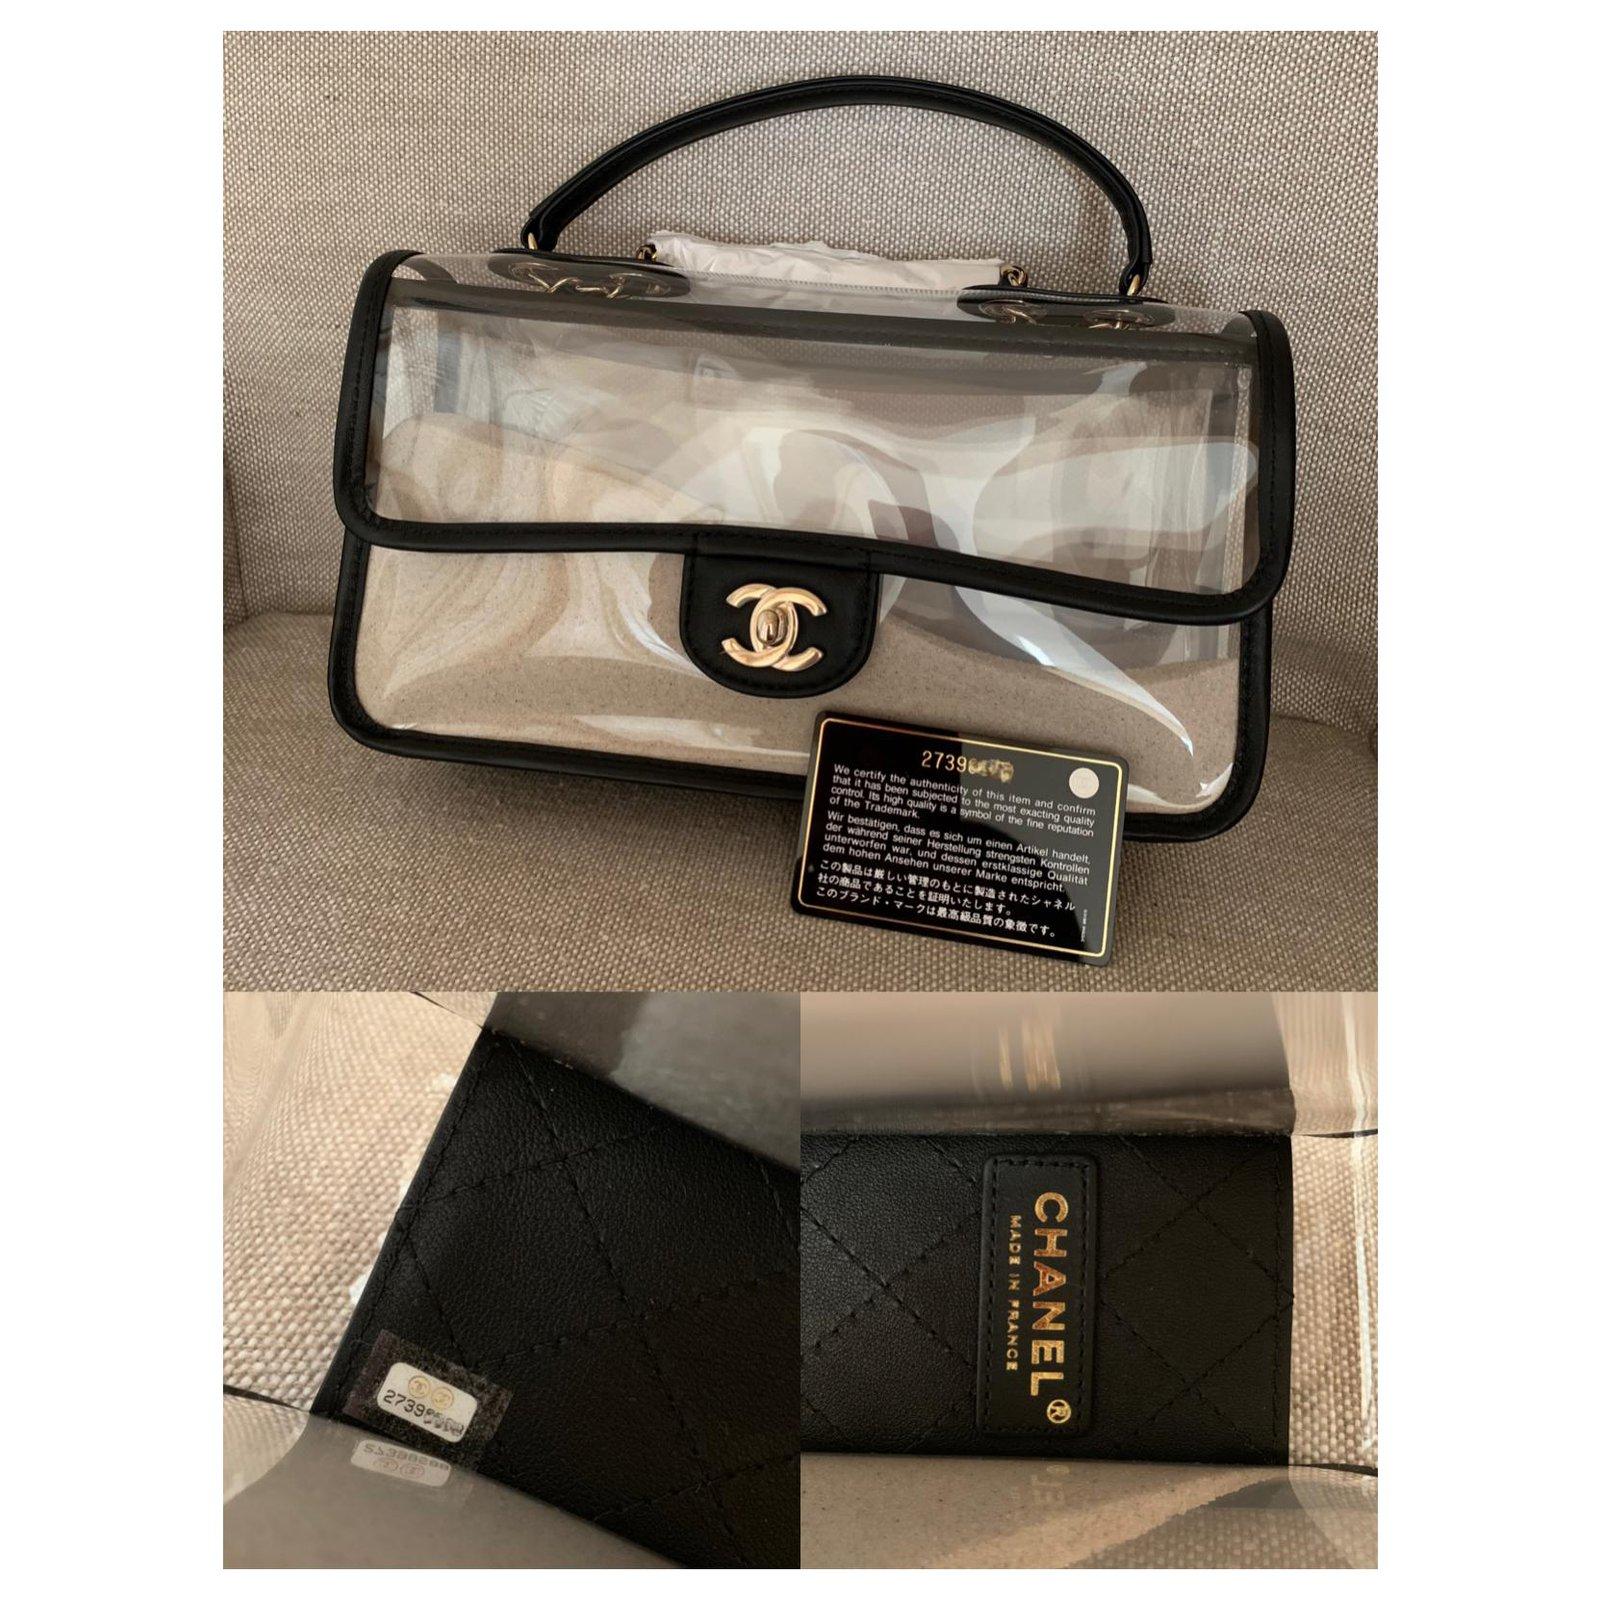 b011162c27c8e Chanel Coco Sand PVC Flap Bag Handbags Plastic Black ref.117205 - Joli  Closet